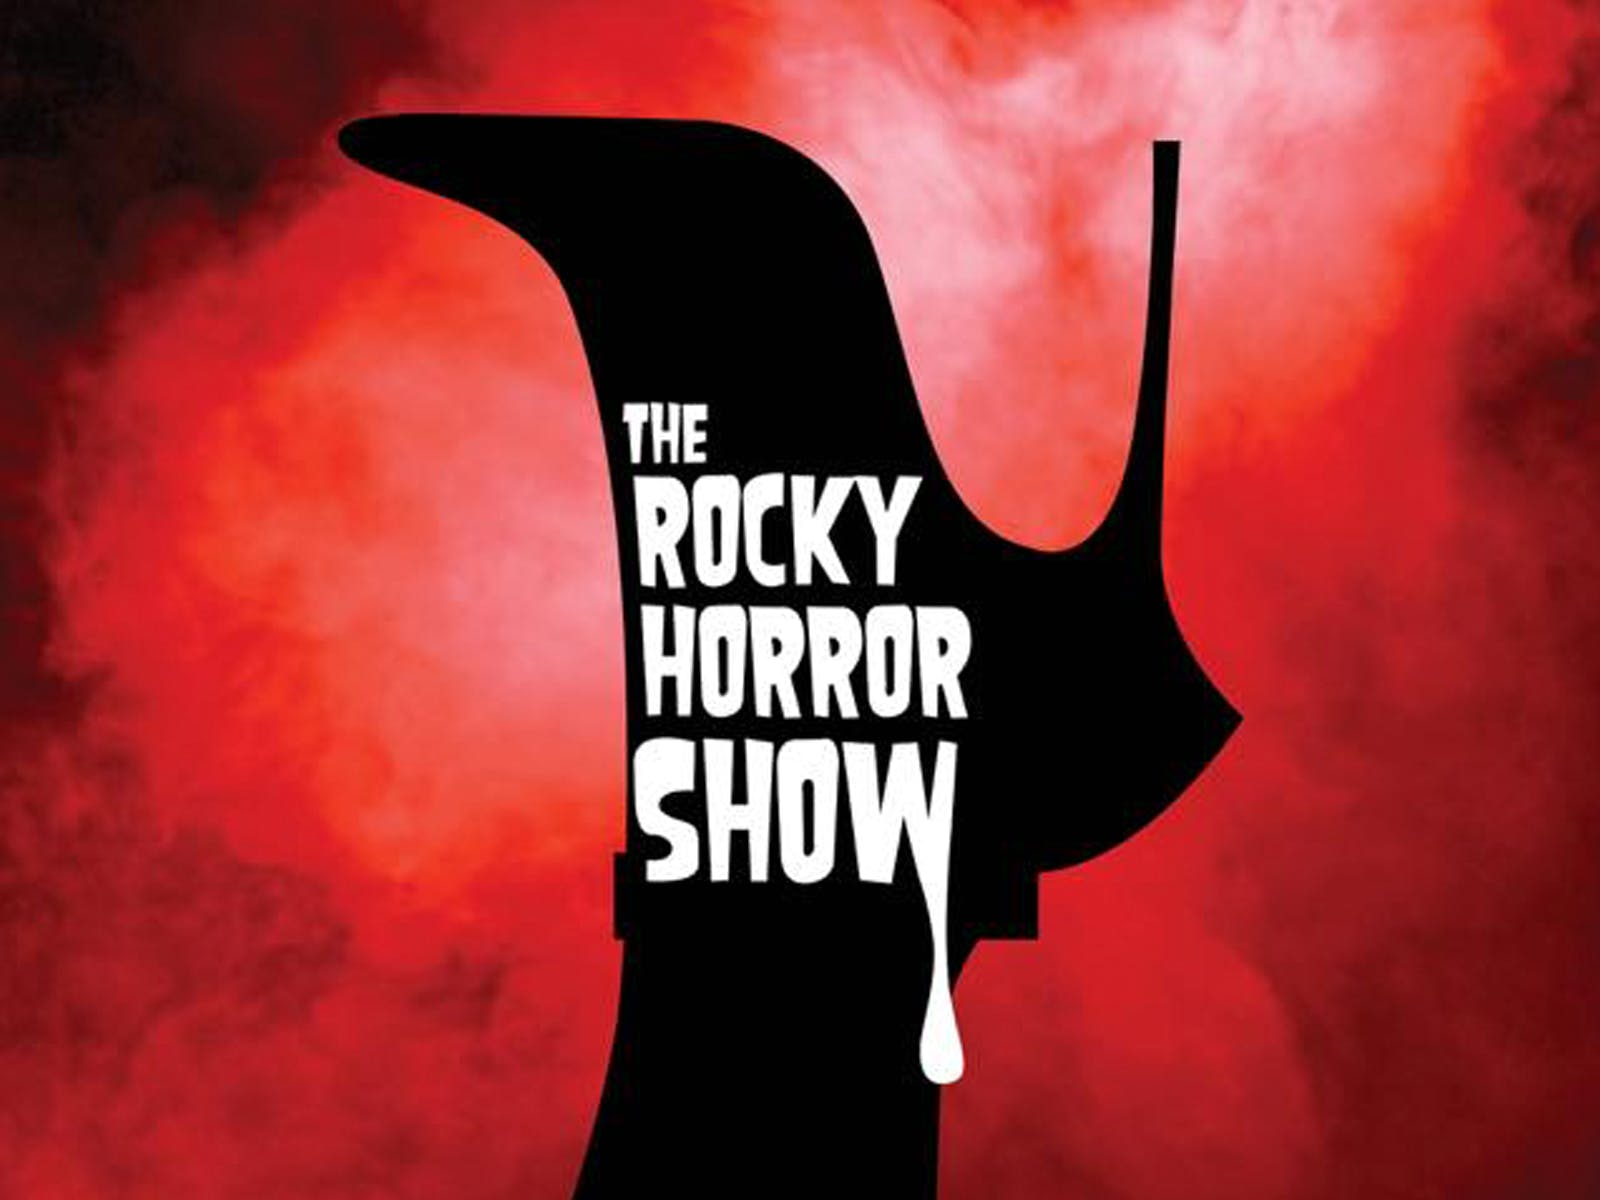 The Rocky Horror Show Tickets Sf Bay Area Todaytix